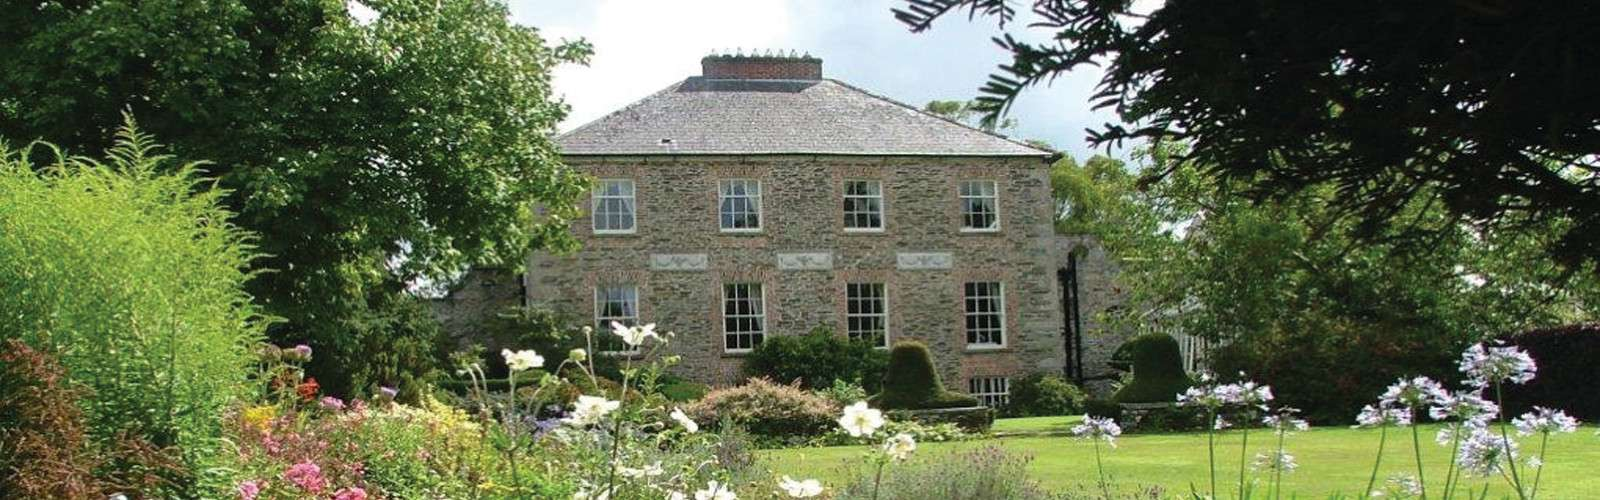 kilmokea-wexford-gardens